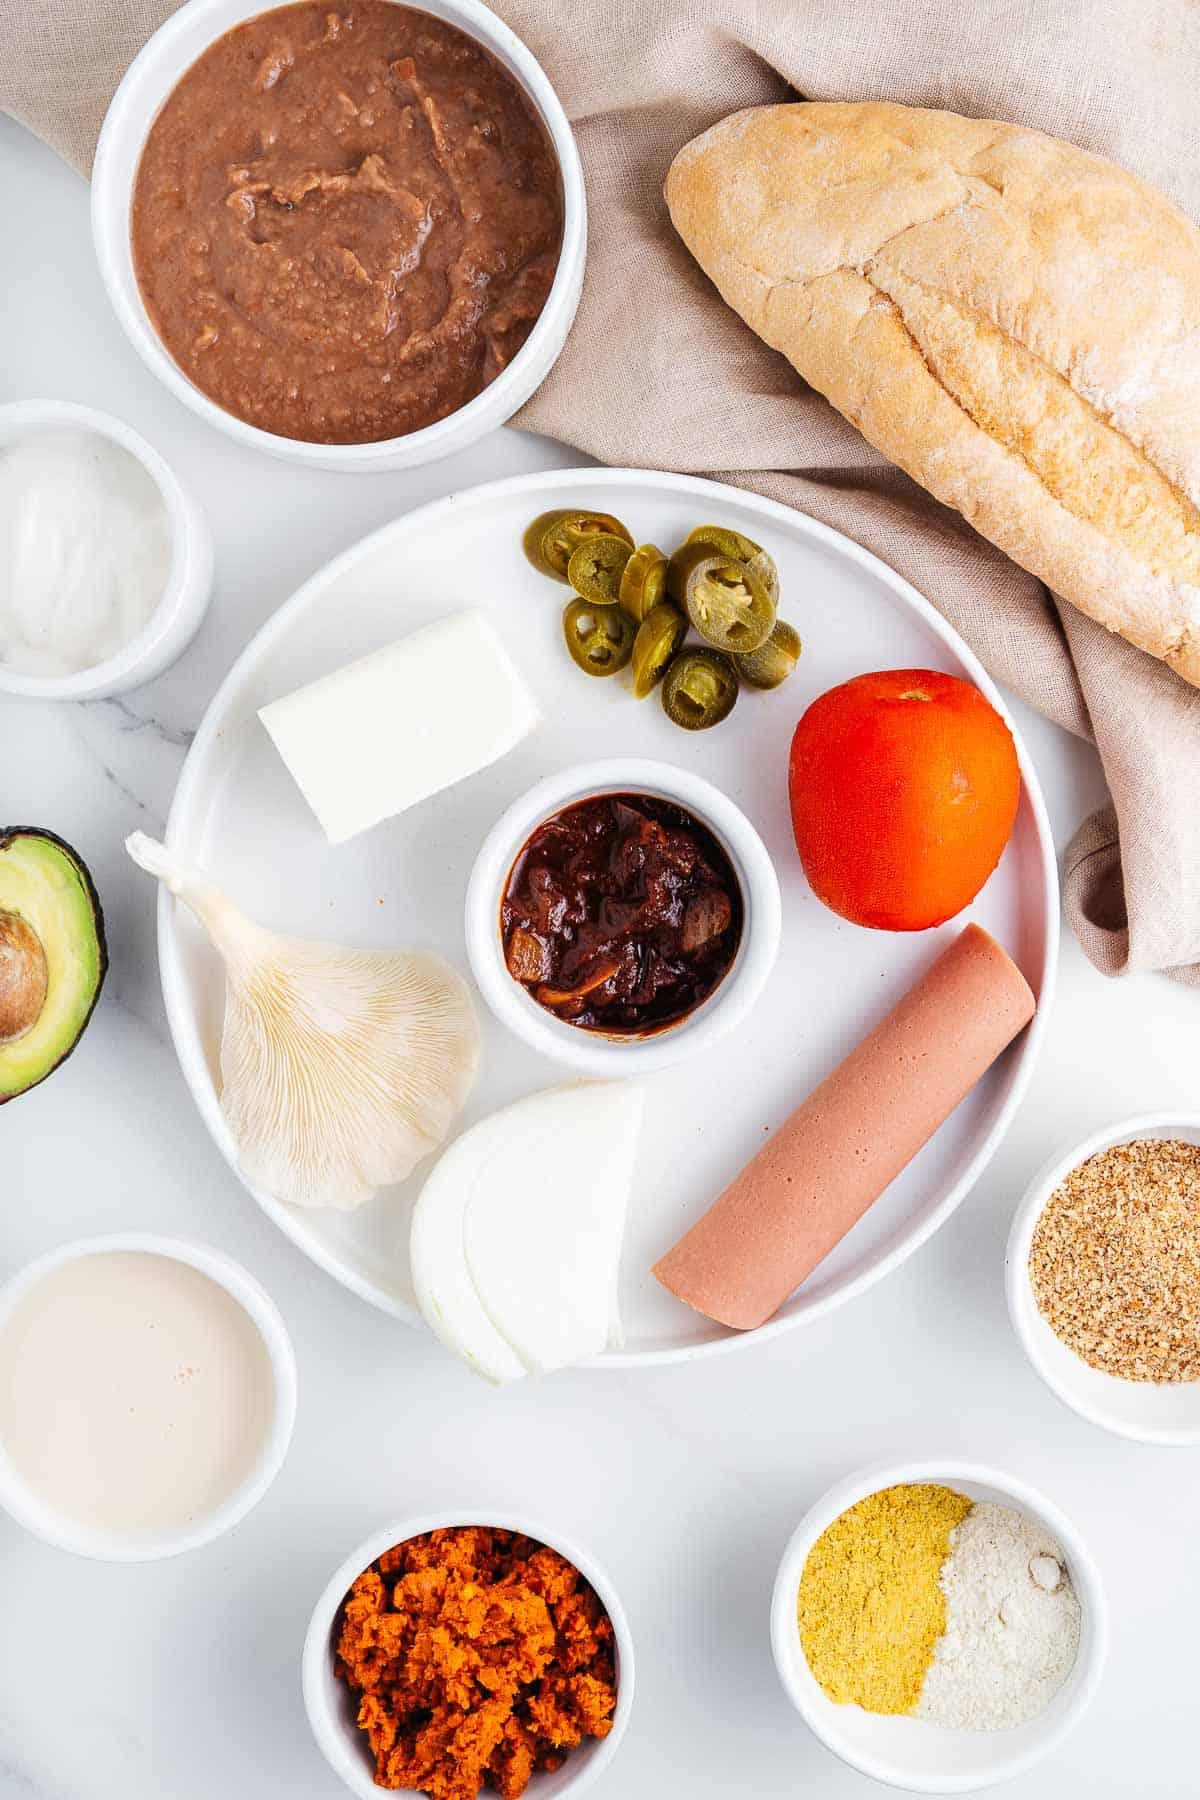 Vegetables, Oyster Mushroom, Refried Beans, Vegan Ham, Spices, Bolillo Bread, Mayo, Avocado, Soy Milk, and Vegan Chorizo